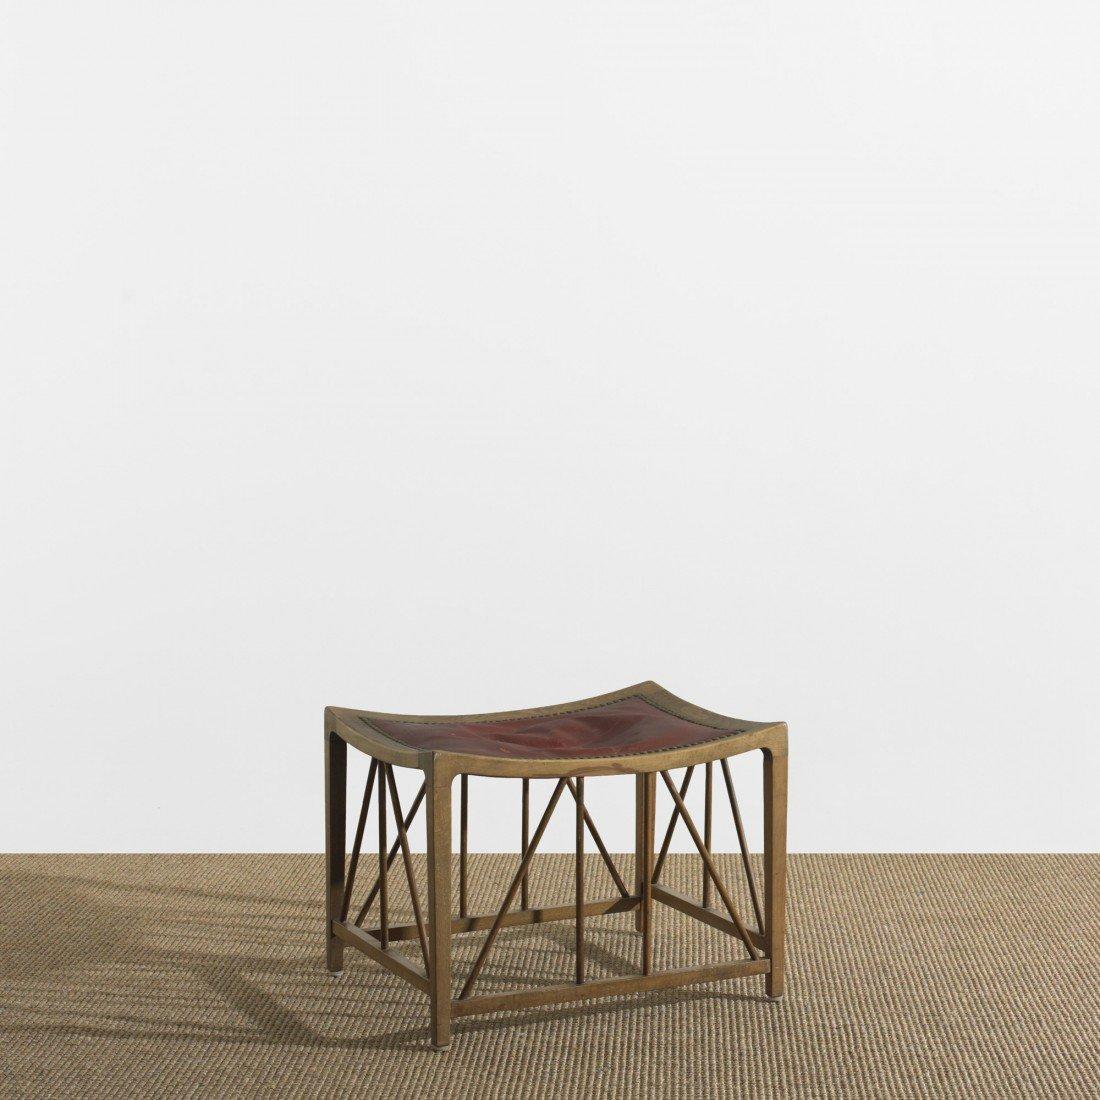 102: Josef Frank Egyptian stool